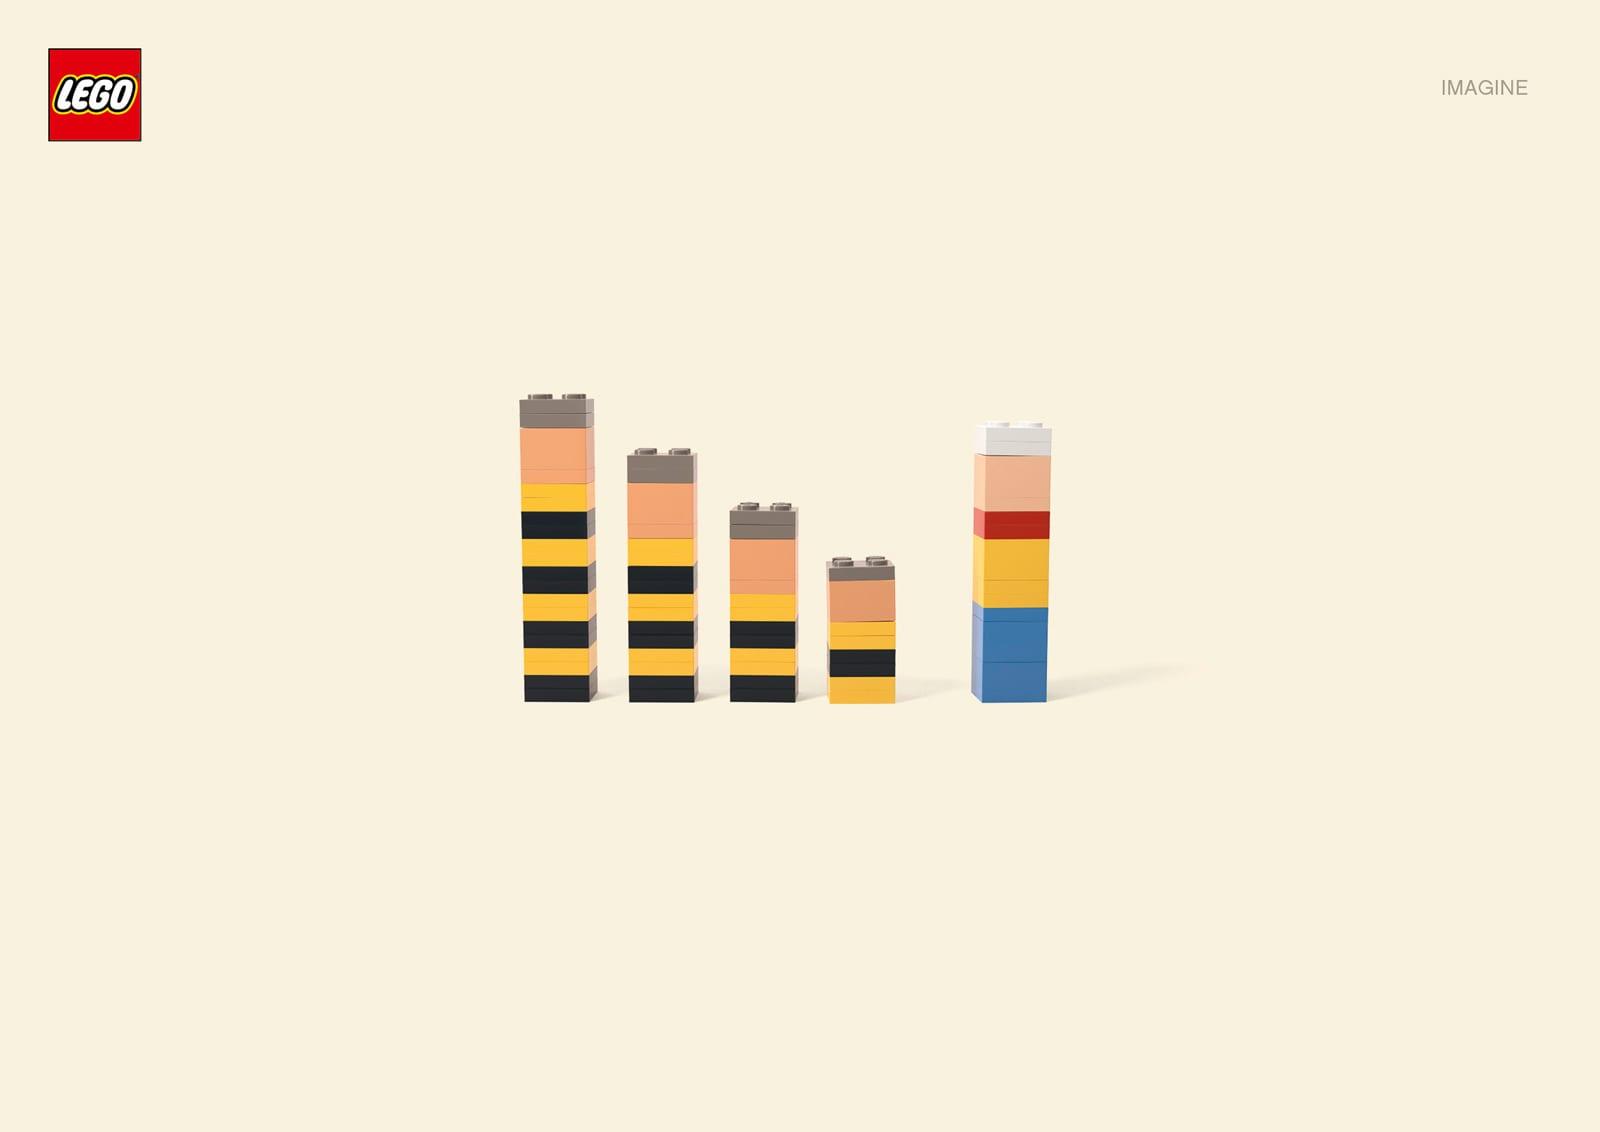 lego minimalista (5)